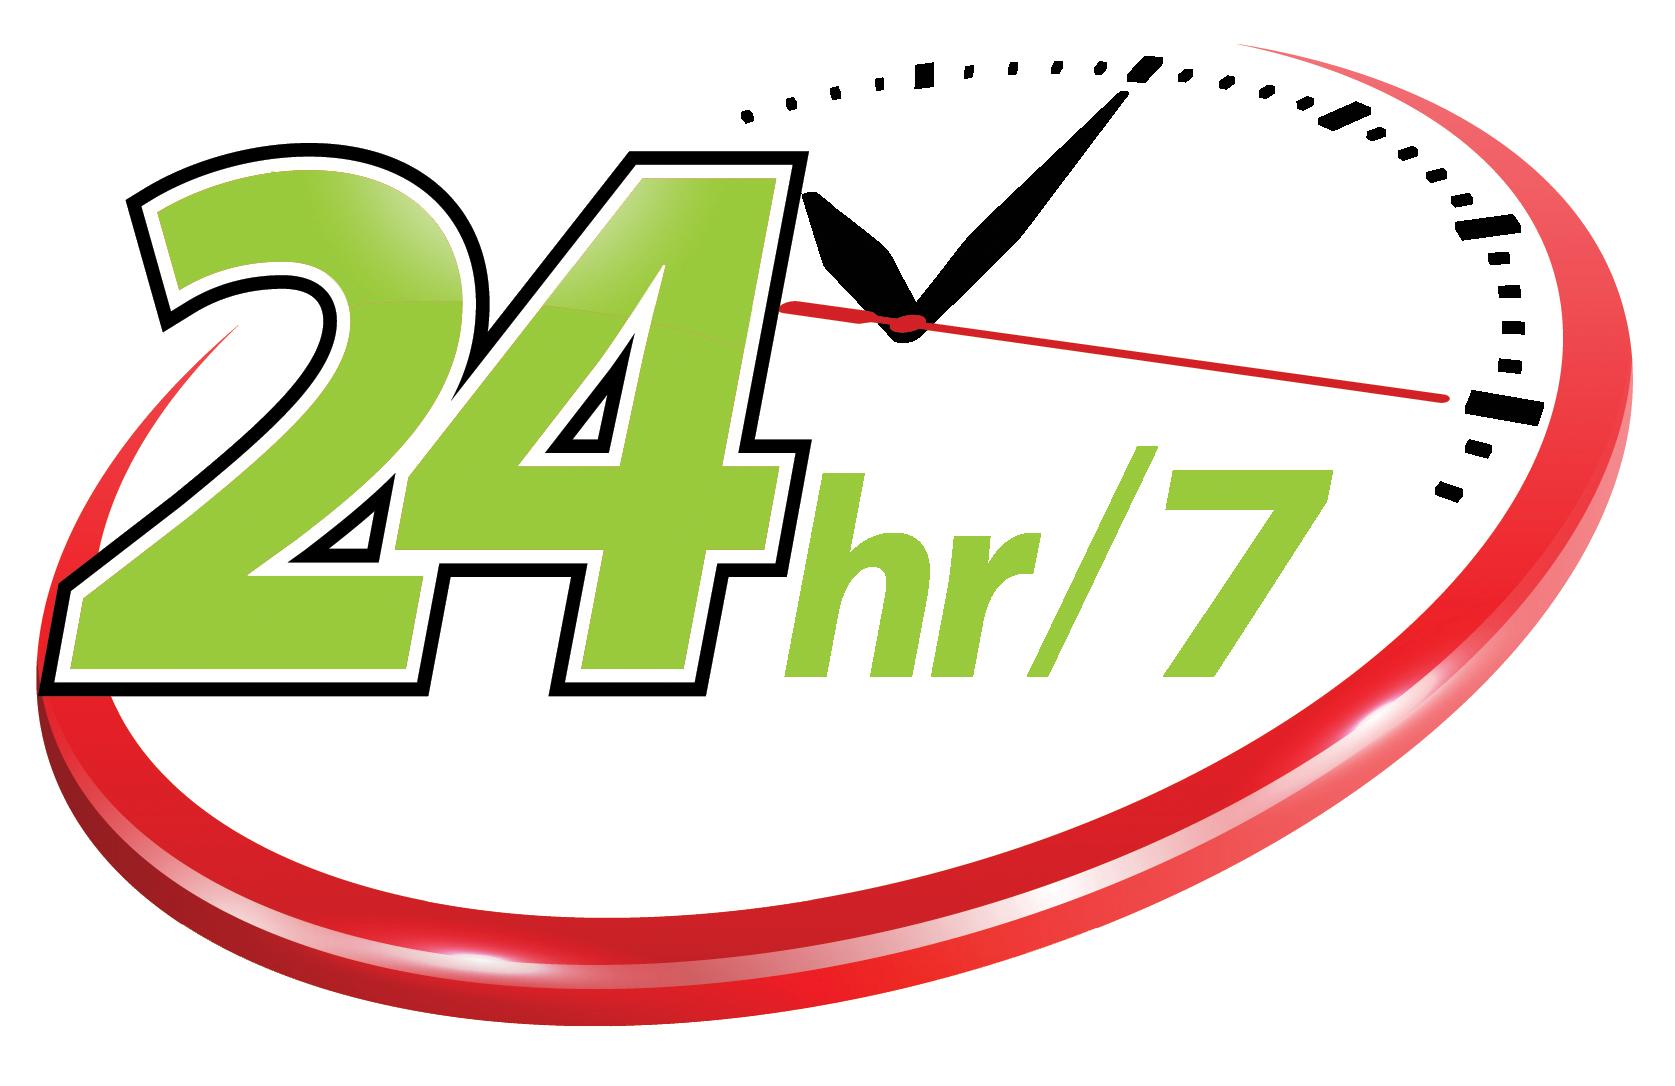 24-7 Emergency Service Response